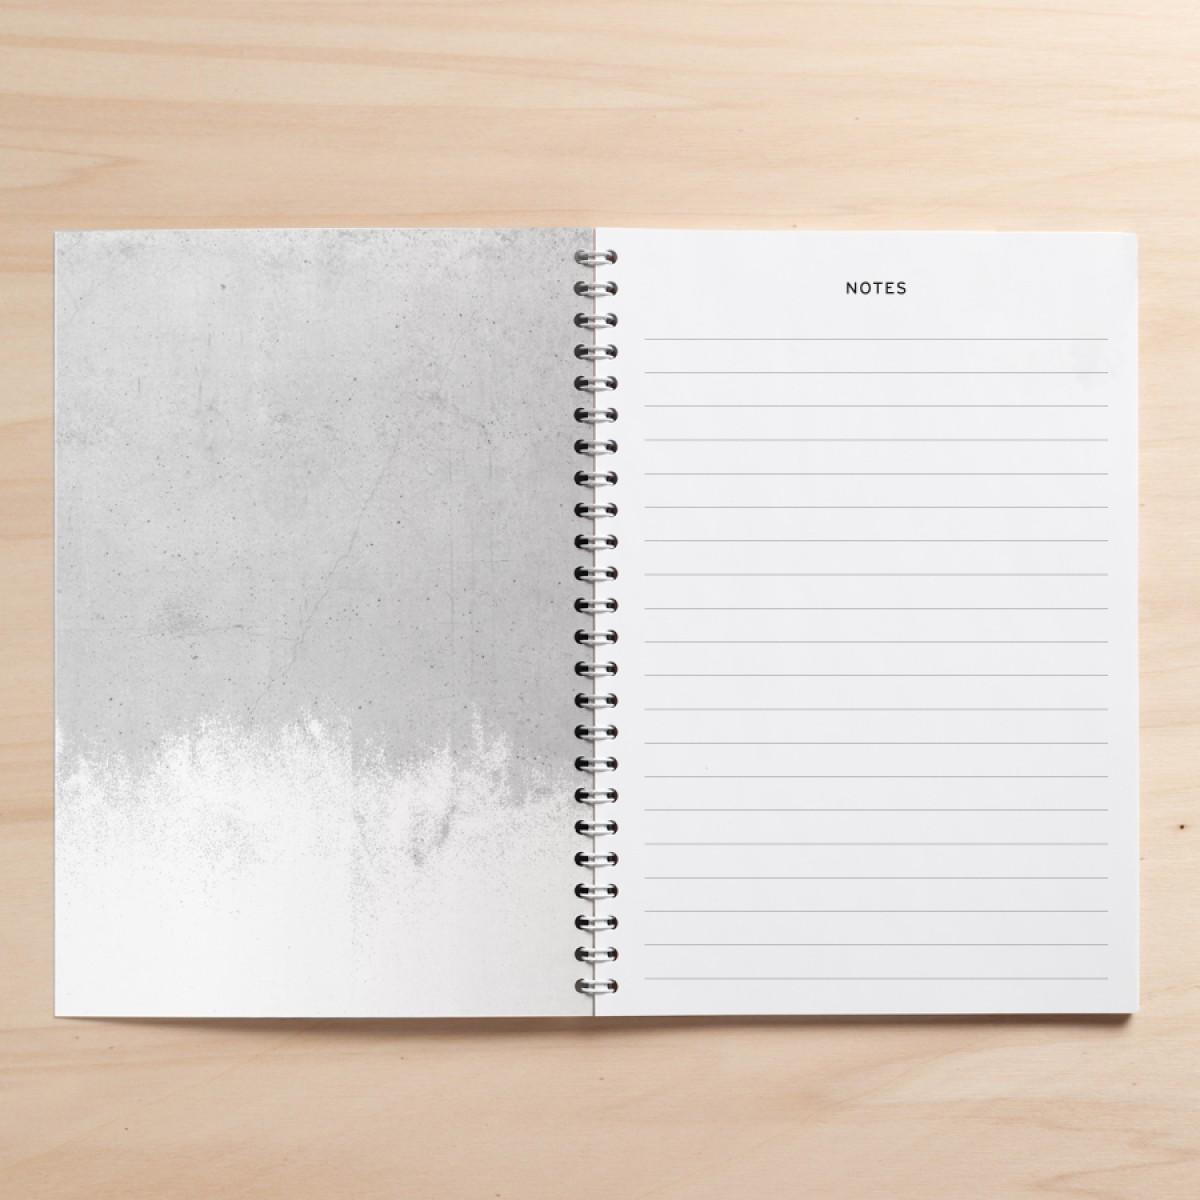 "Amy & Kurt Berlin A5 Notizbuch ""Notes01 Beton"""